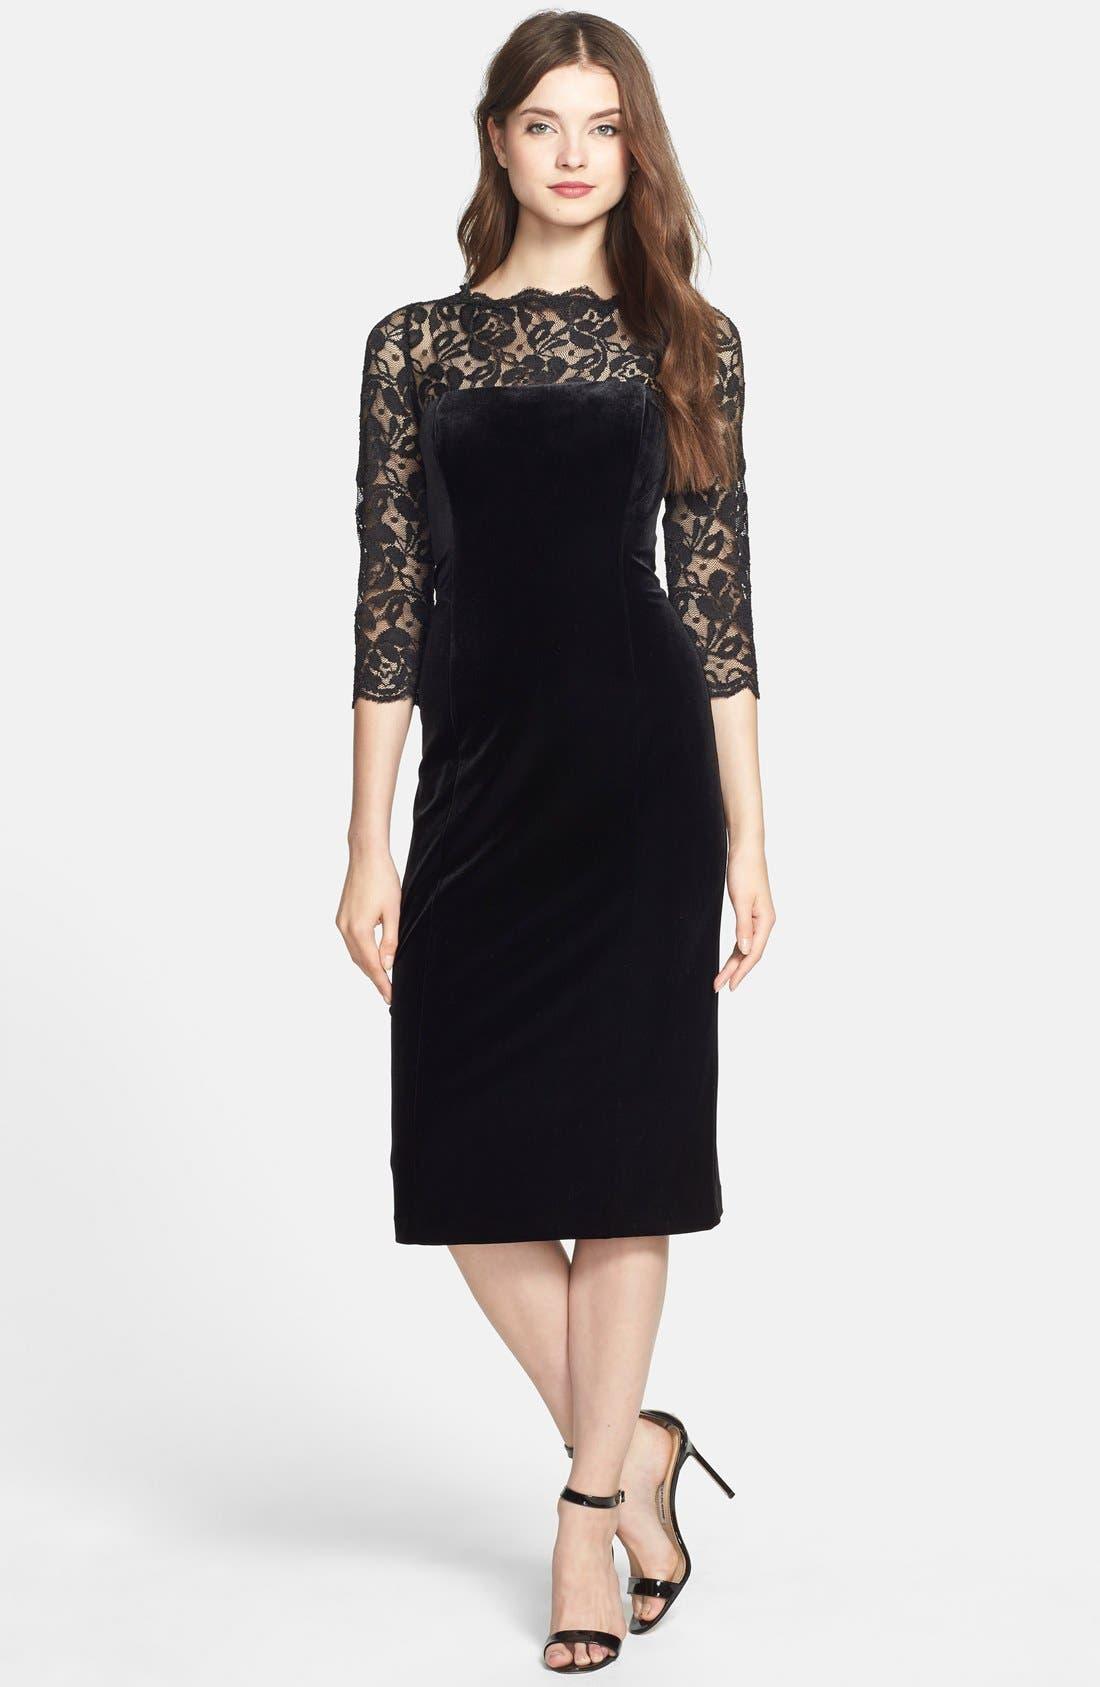 Alternate Image 1 Selected - Eliza J Lace & Velvet Sheath Dress